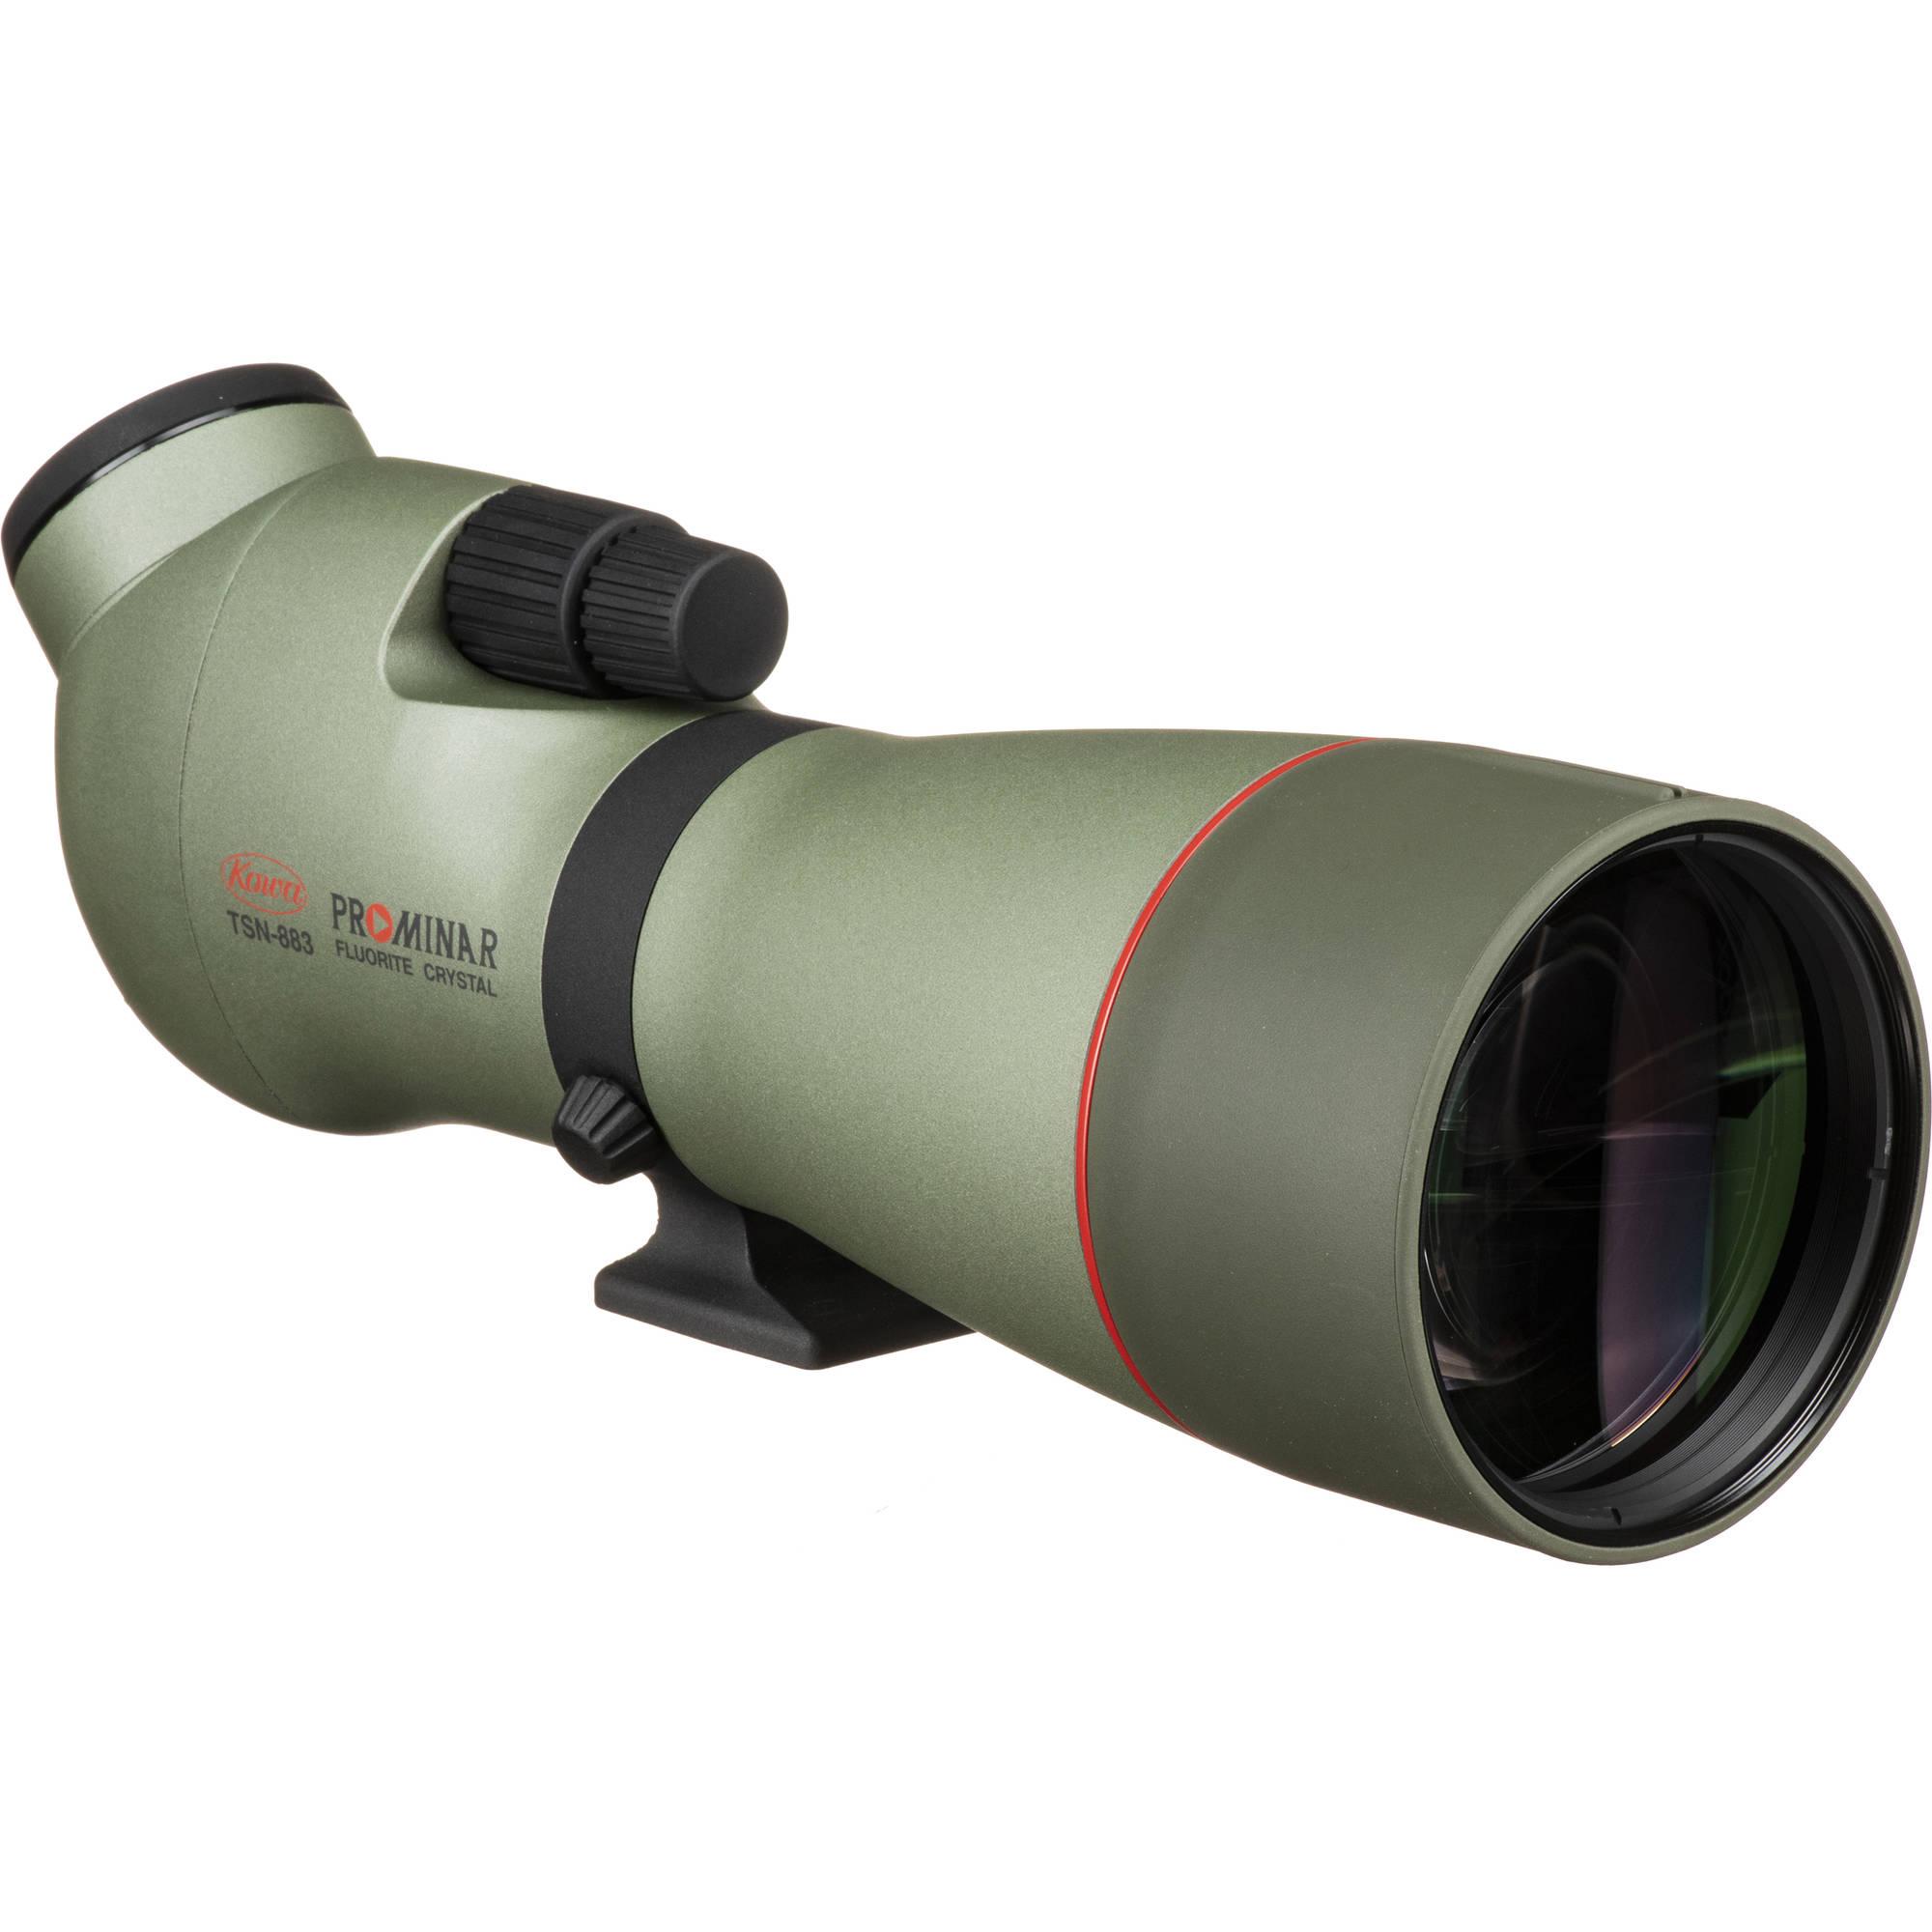 Binocular Cases & Accessories Binoculars & Telescopes Dorr Digital Video Camera For Spotting Scopes